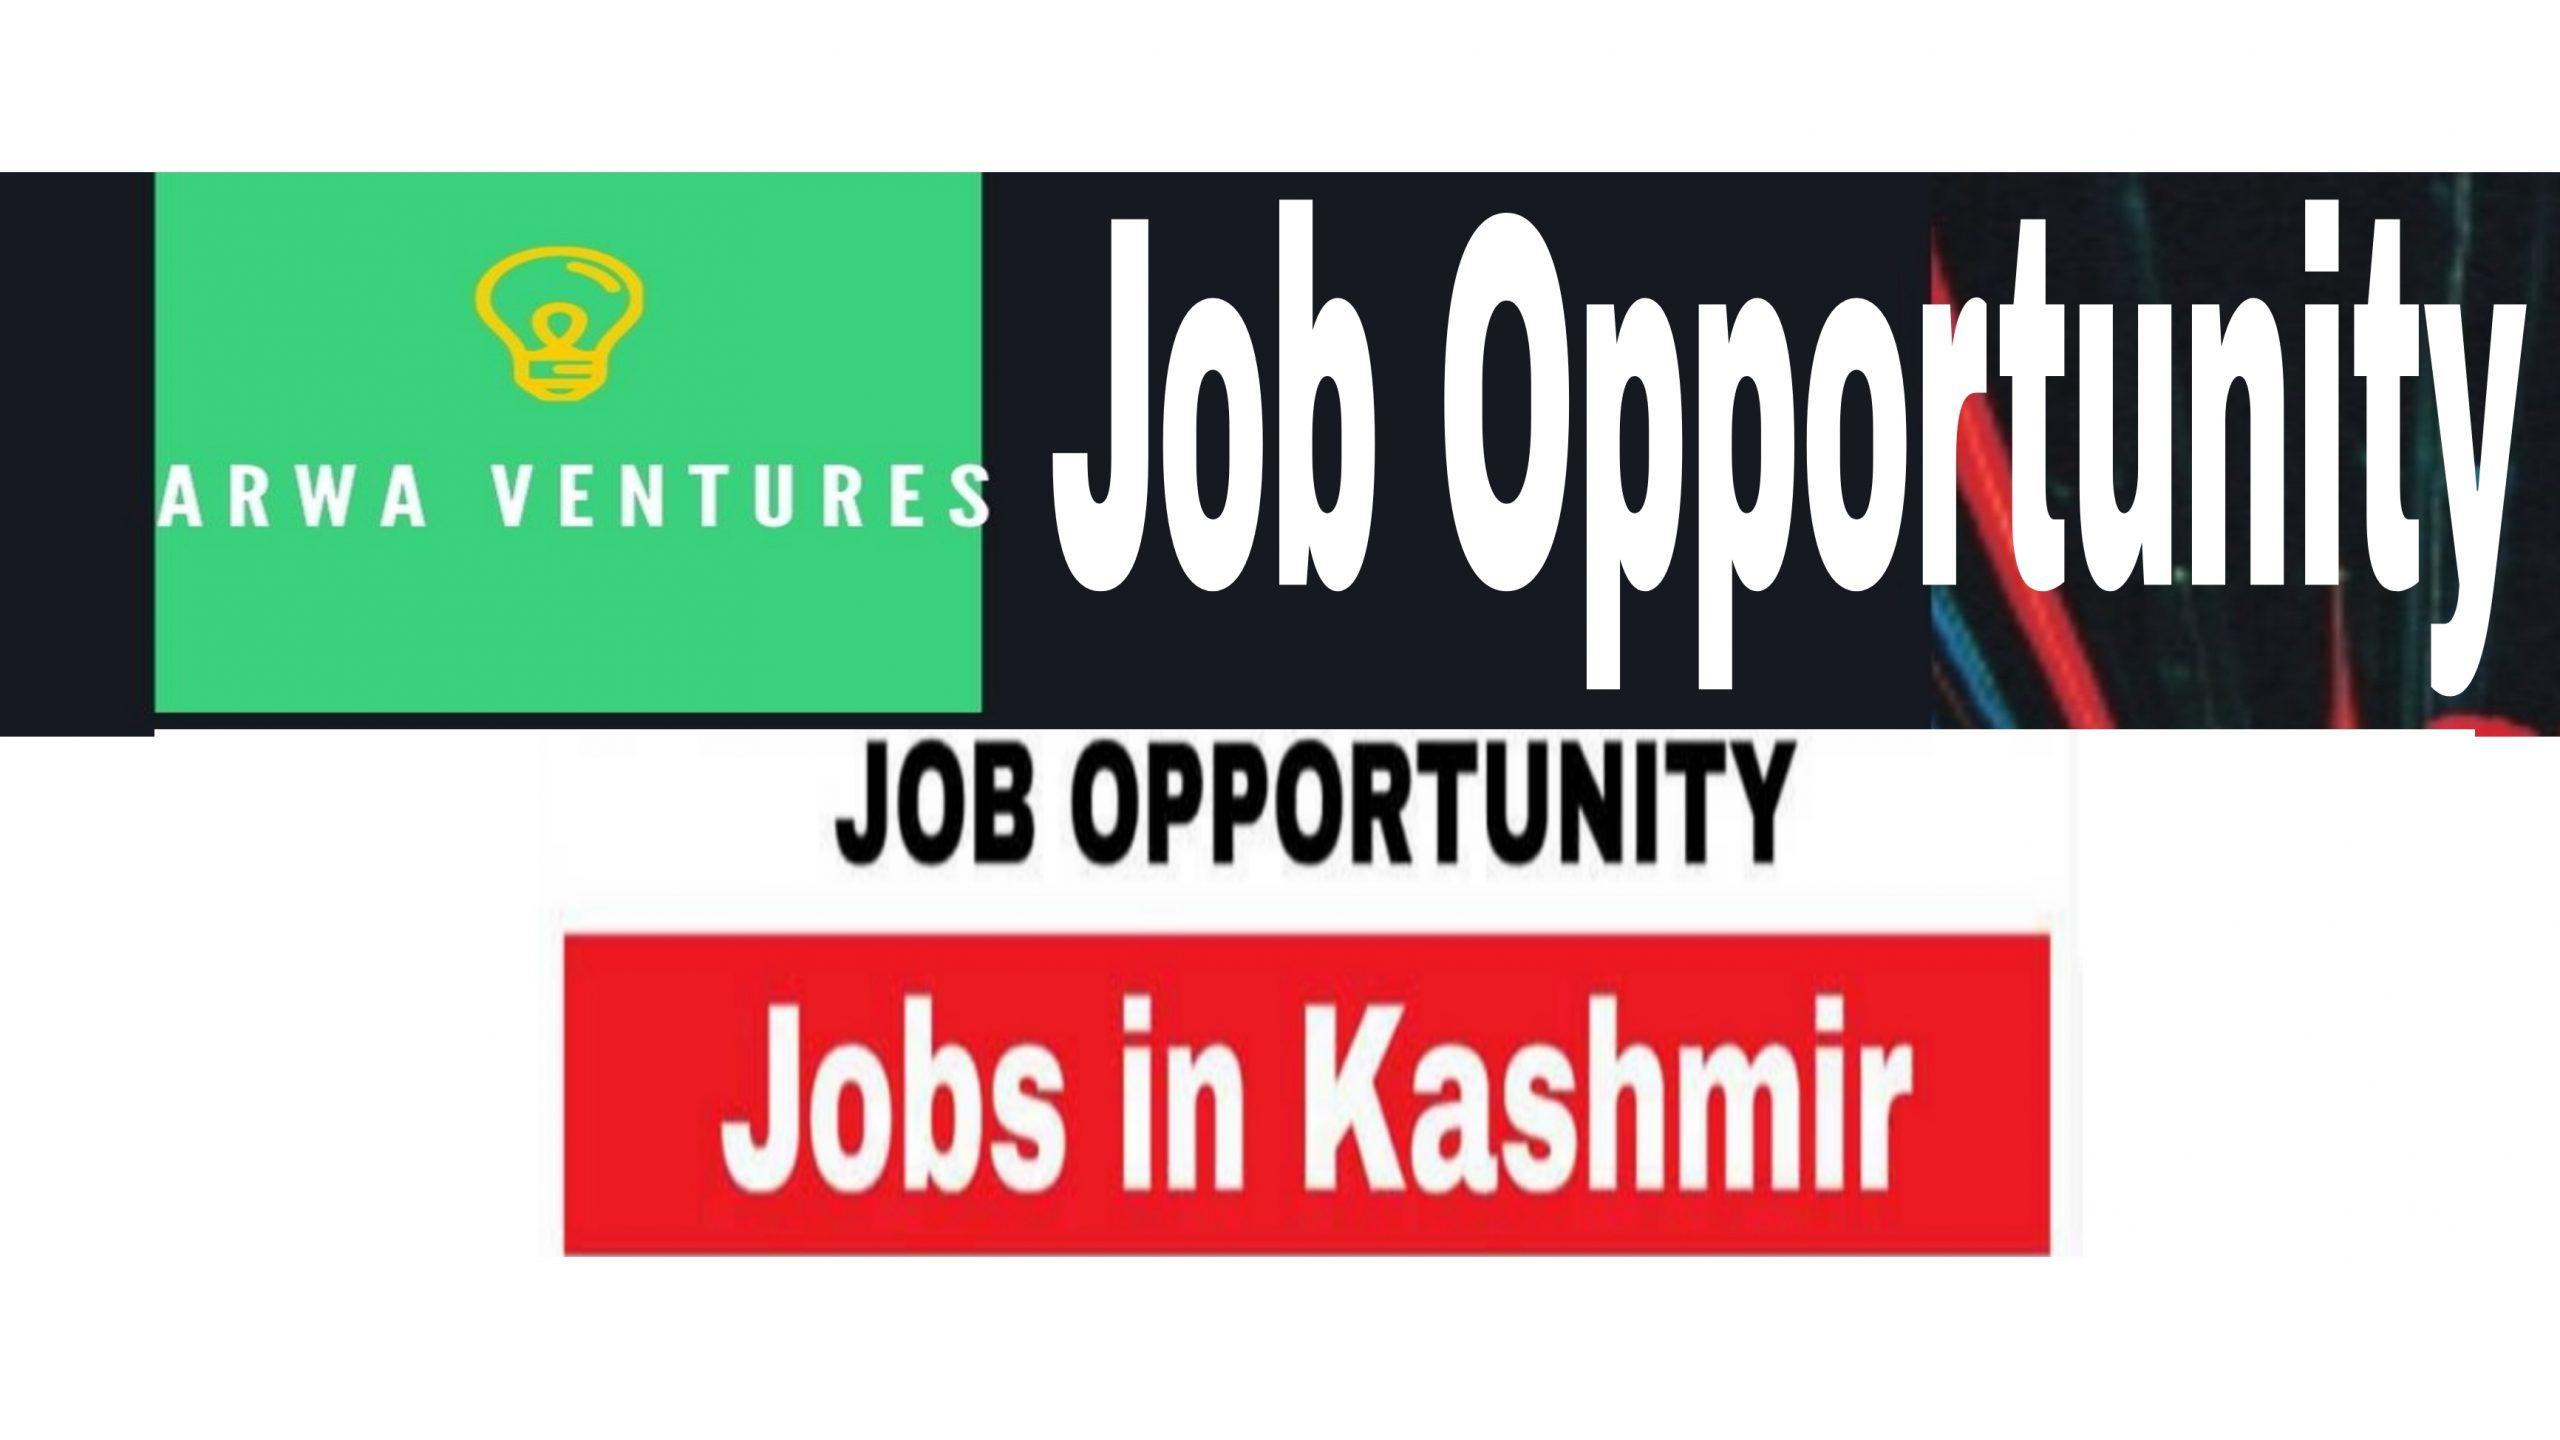 Private jobs Srinagar Arwa ventures Tengpora byepass Srinagar